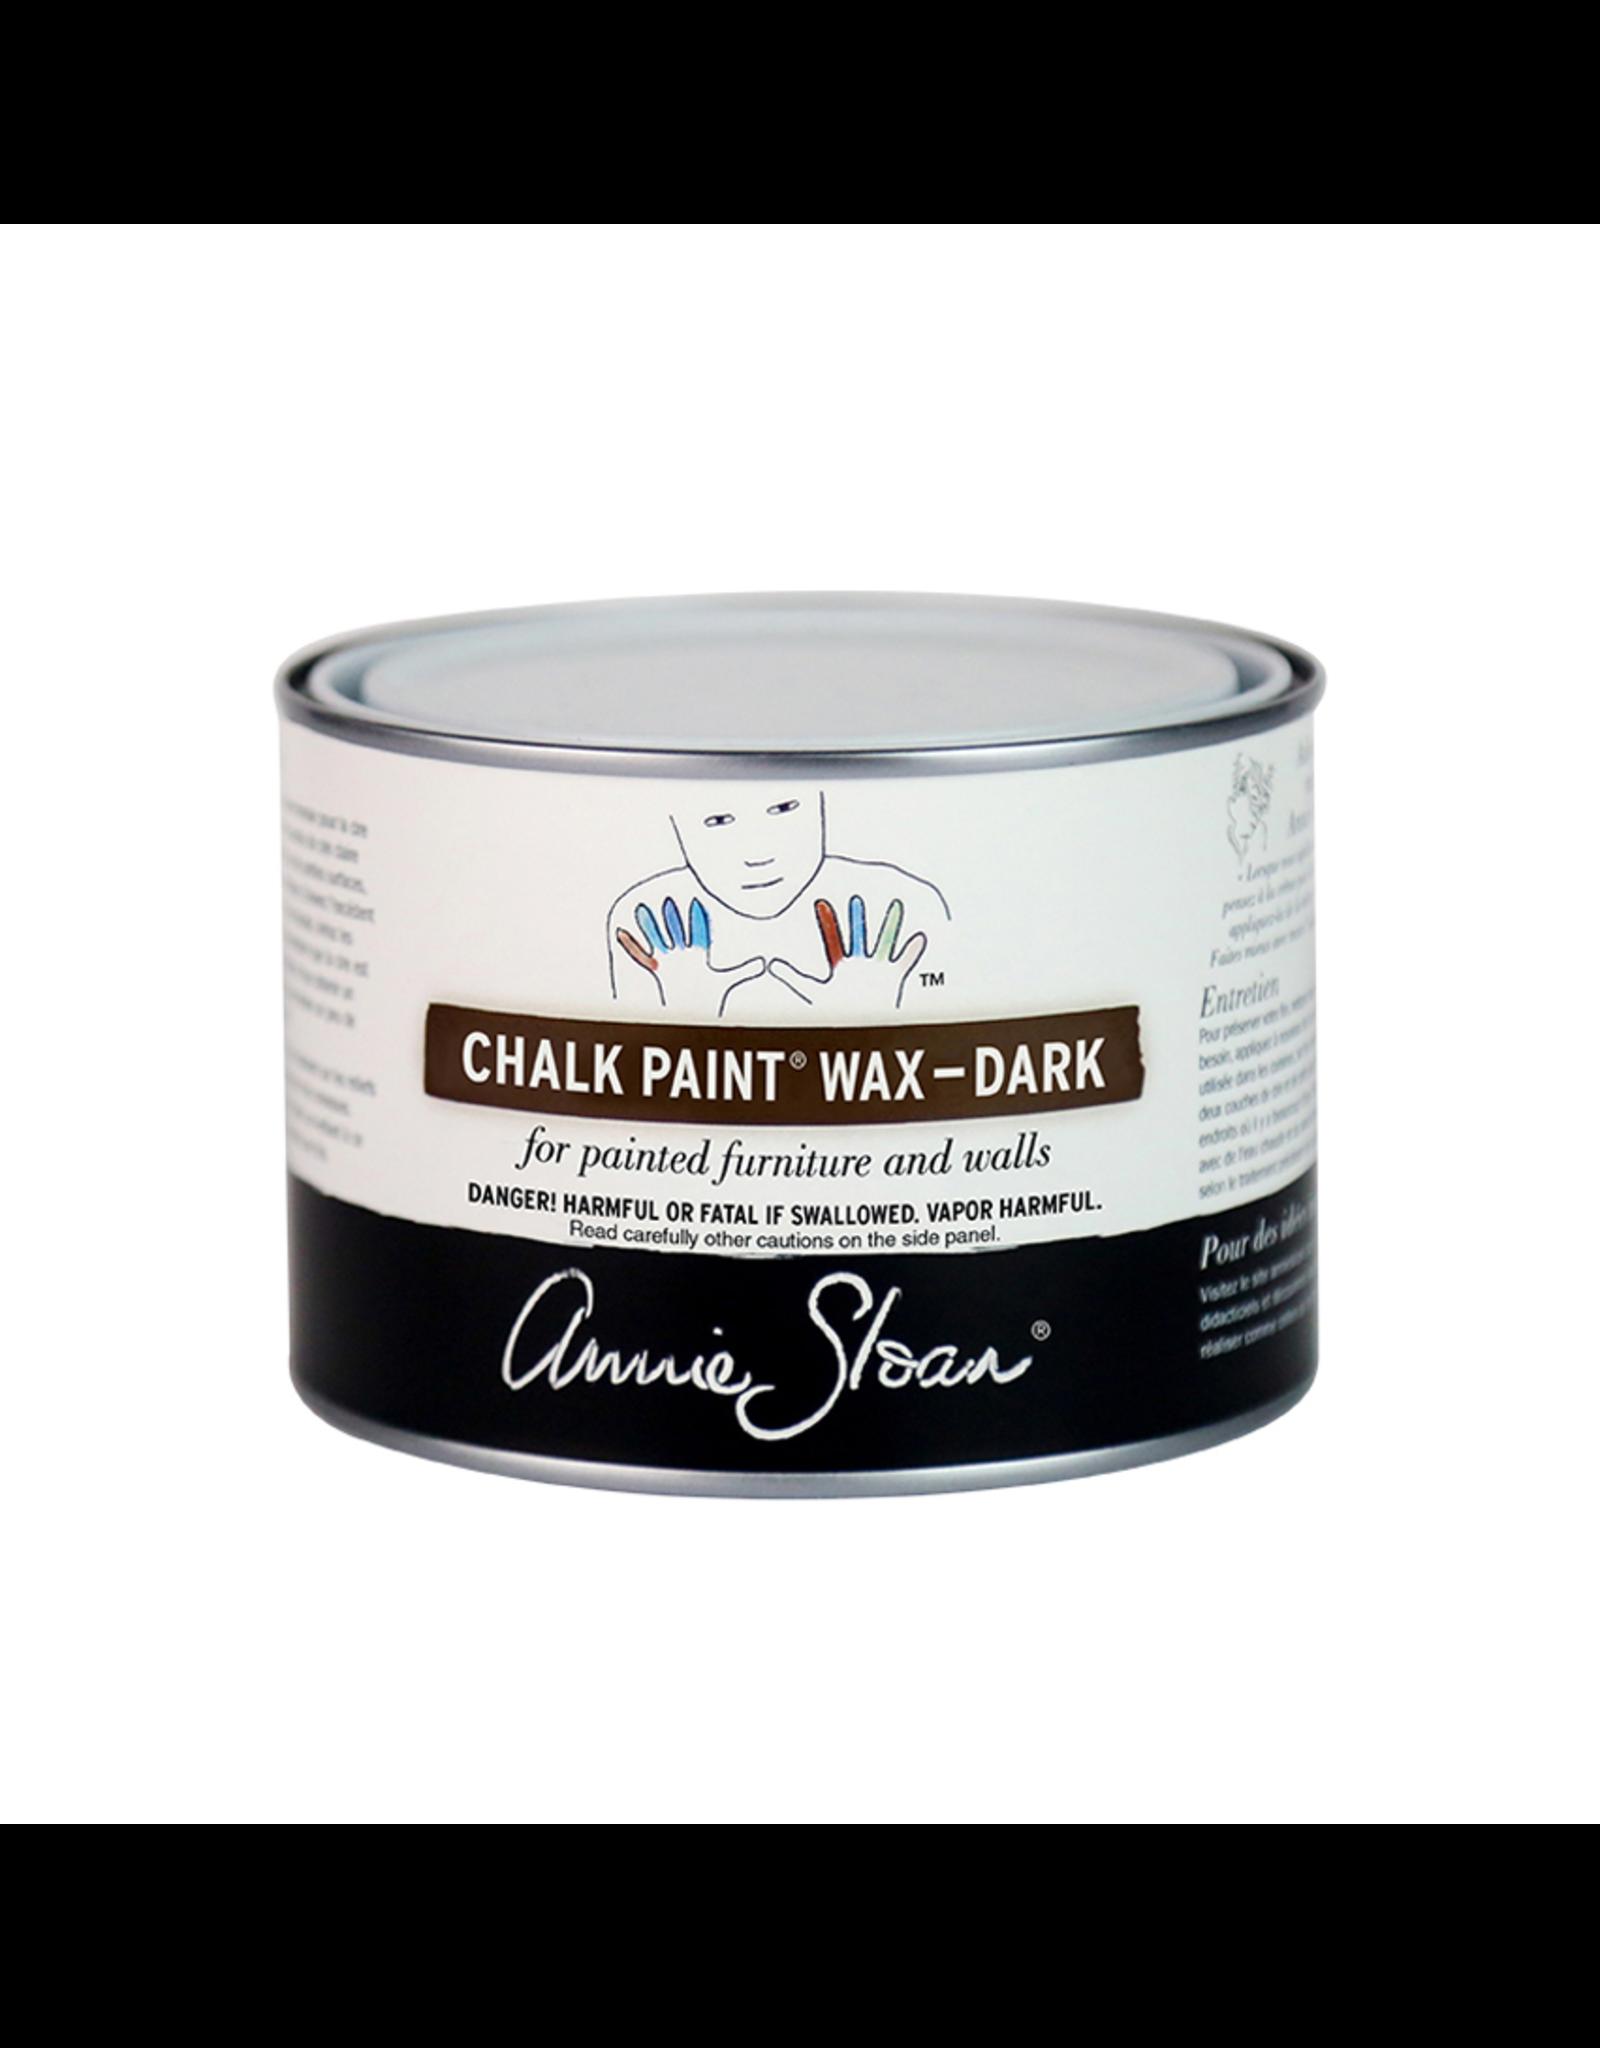 Chalk Paint Wax - Dark